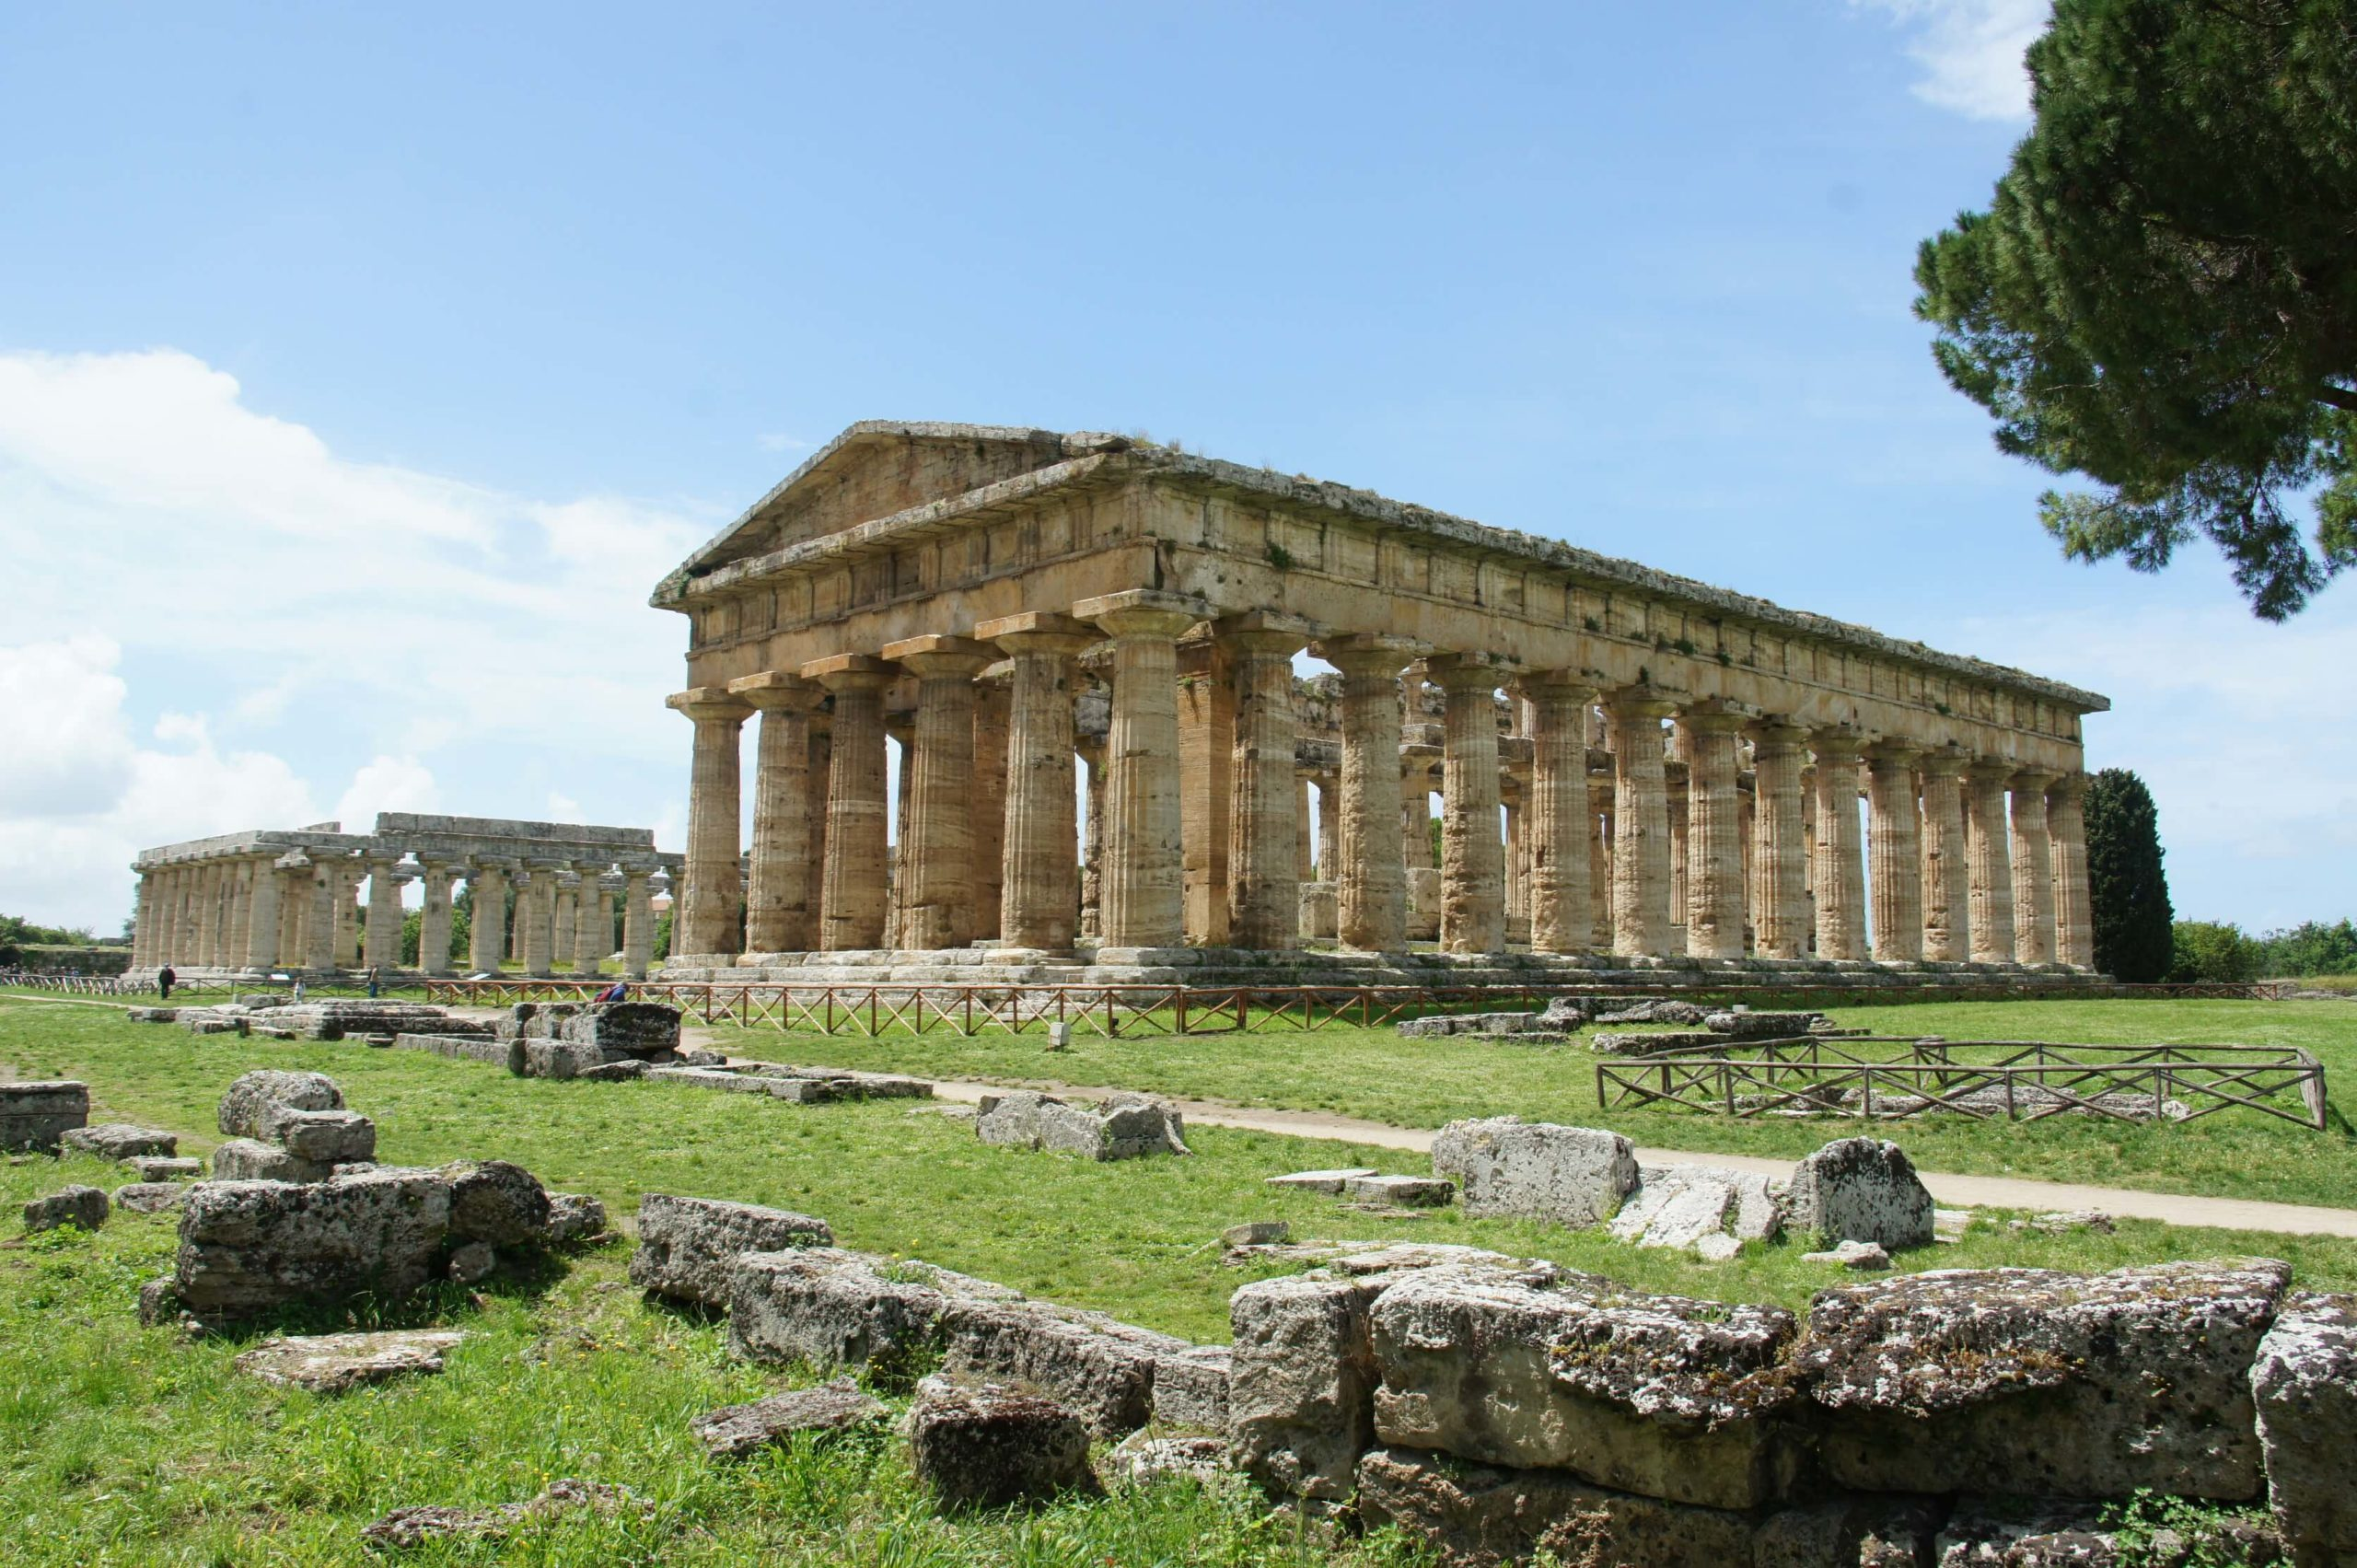 Paestum, Velia and Padula – Italy